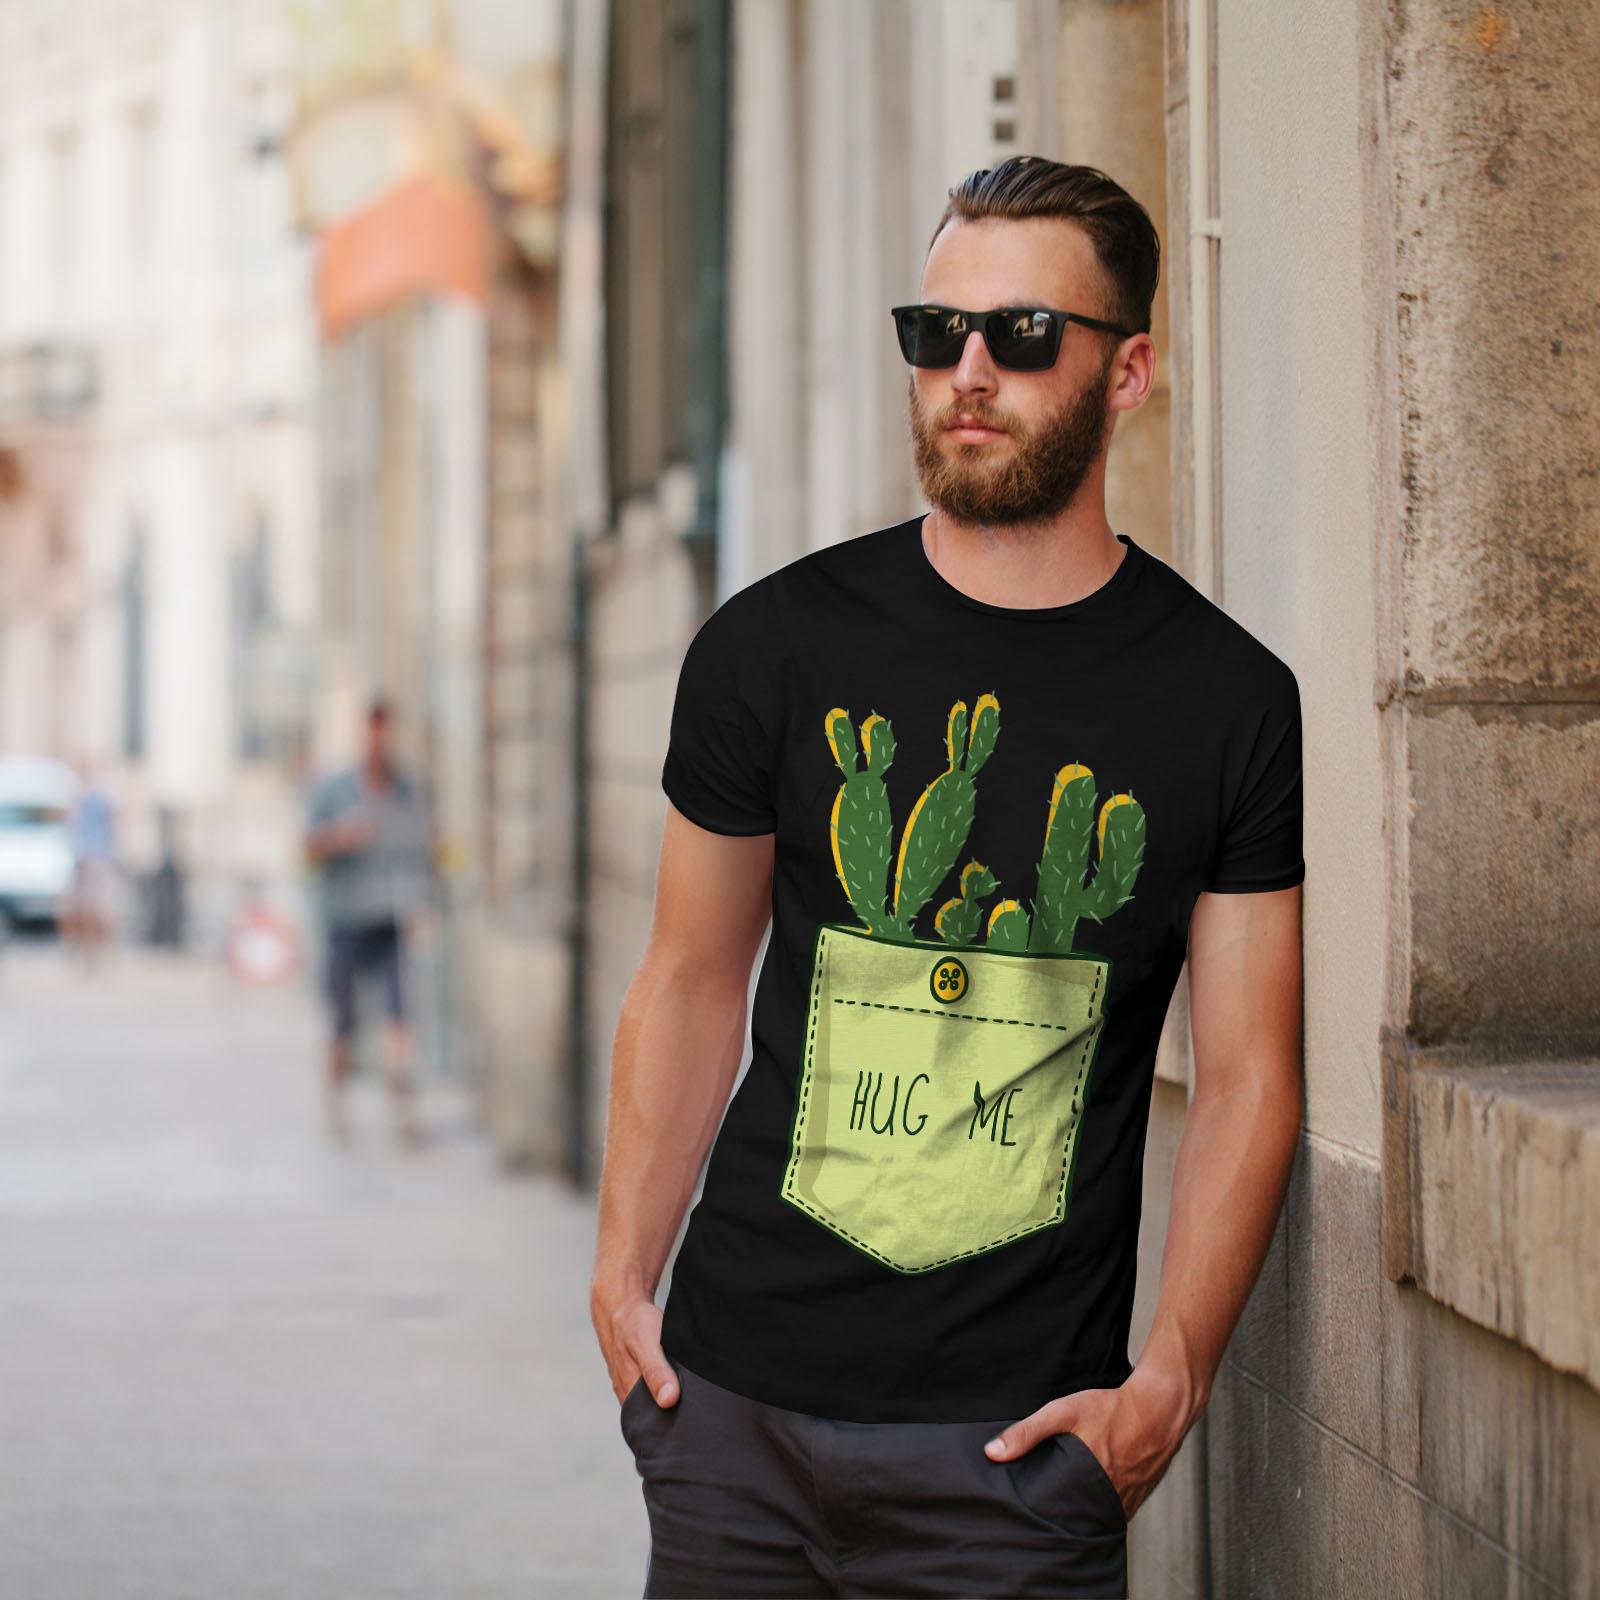 miniature 5 - Wellcoda Hug Me Cactus Funny Mens T-shirt,  Graphic Design Printed Tee